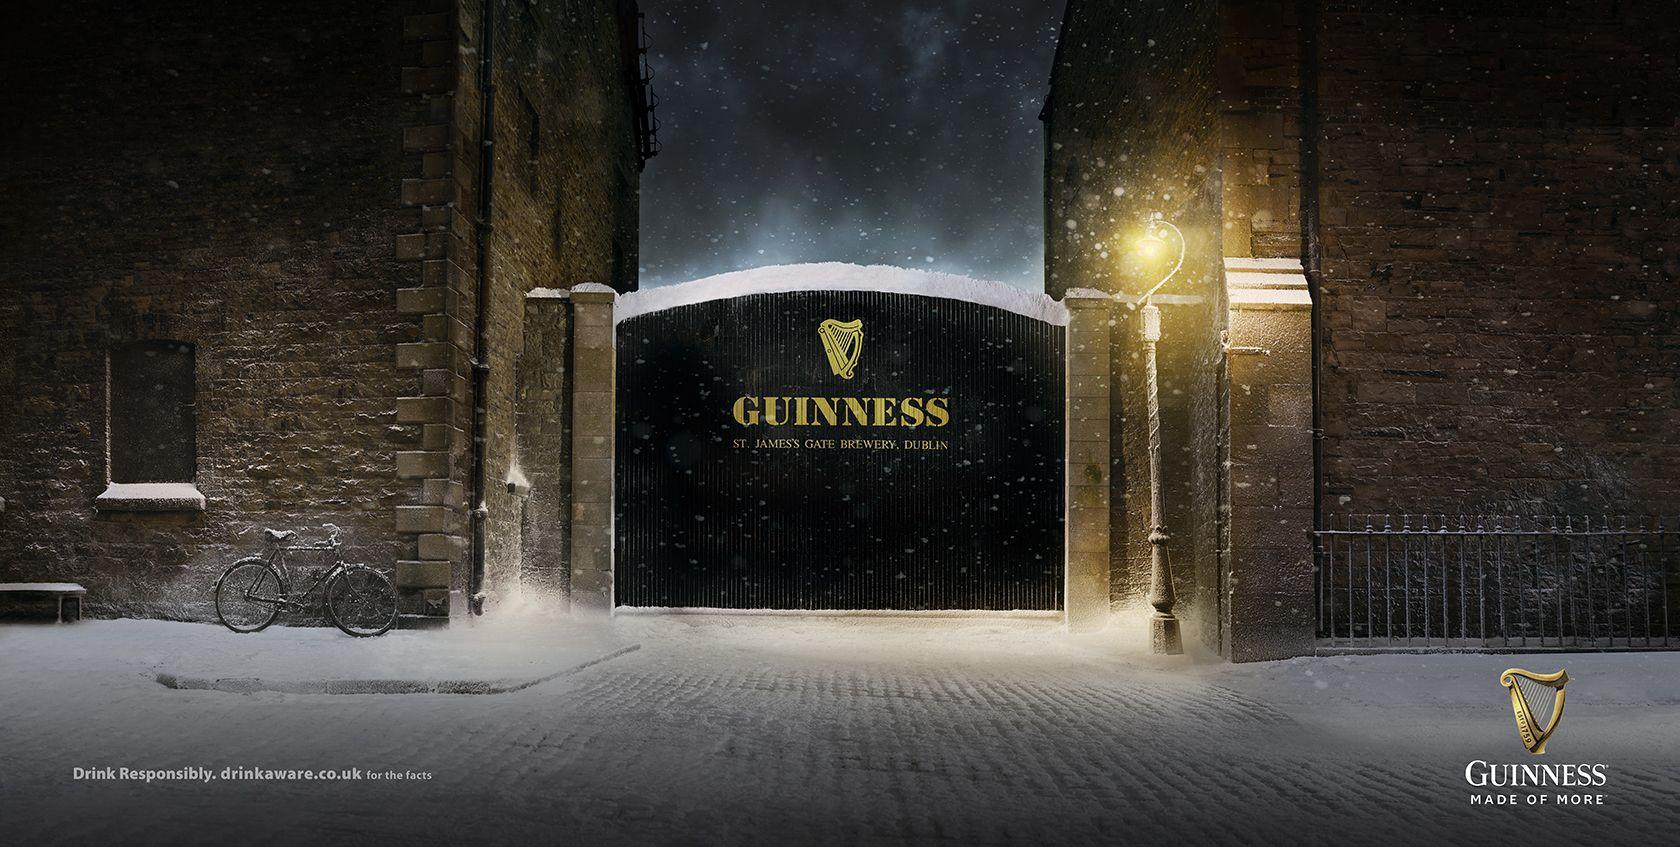 Alex Telfer Guinness Christmas Advertising Photography